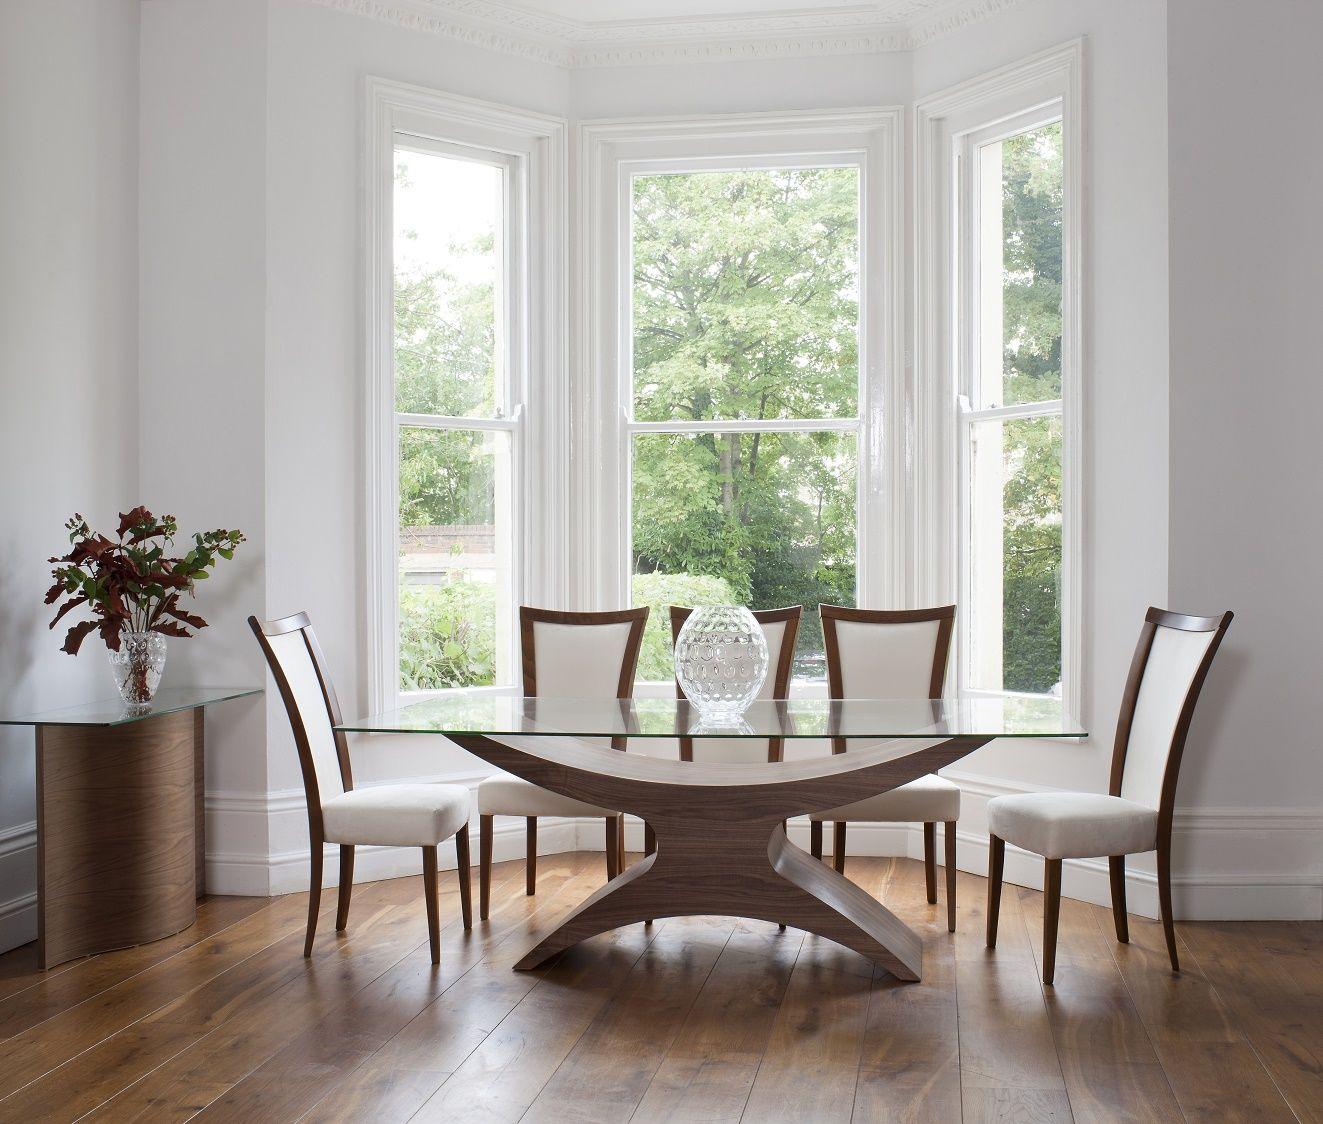 Tom Schneider Atlas Large Dining Table | Mia Stanza